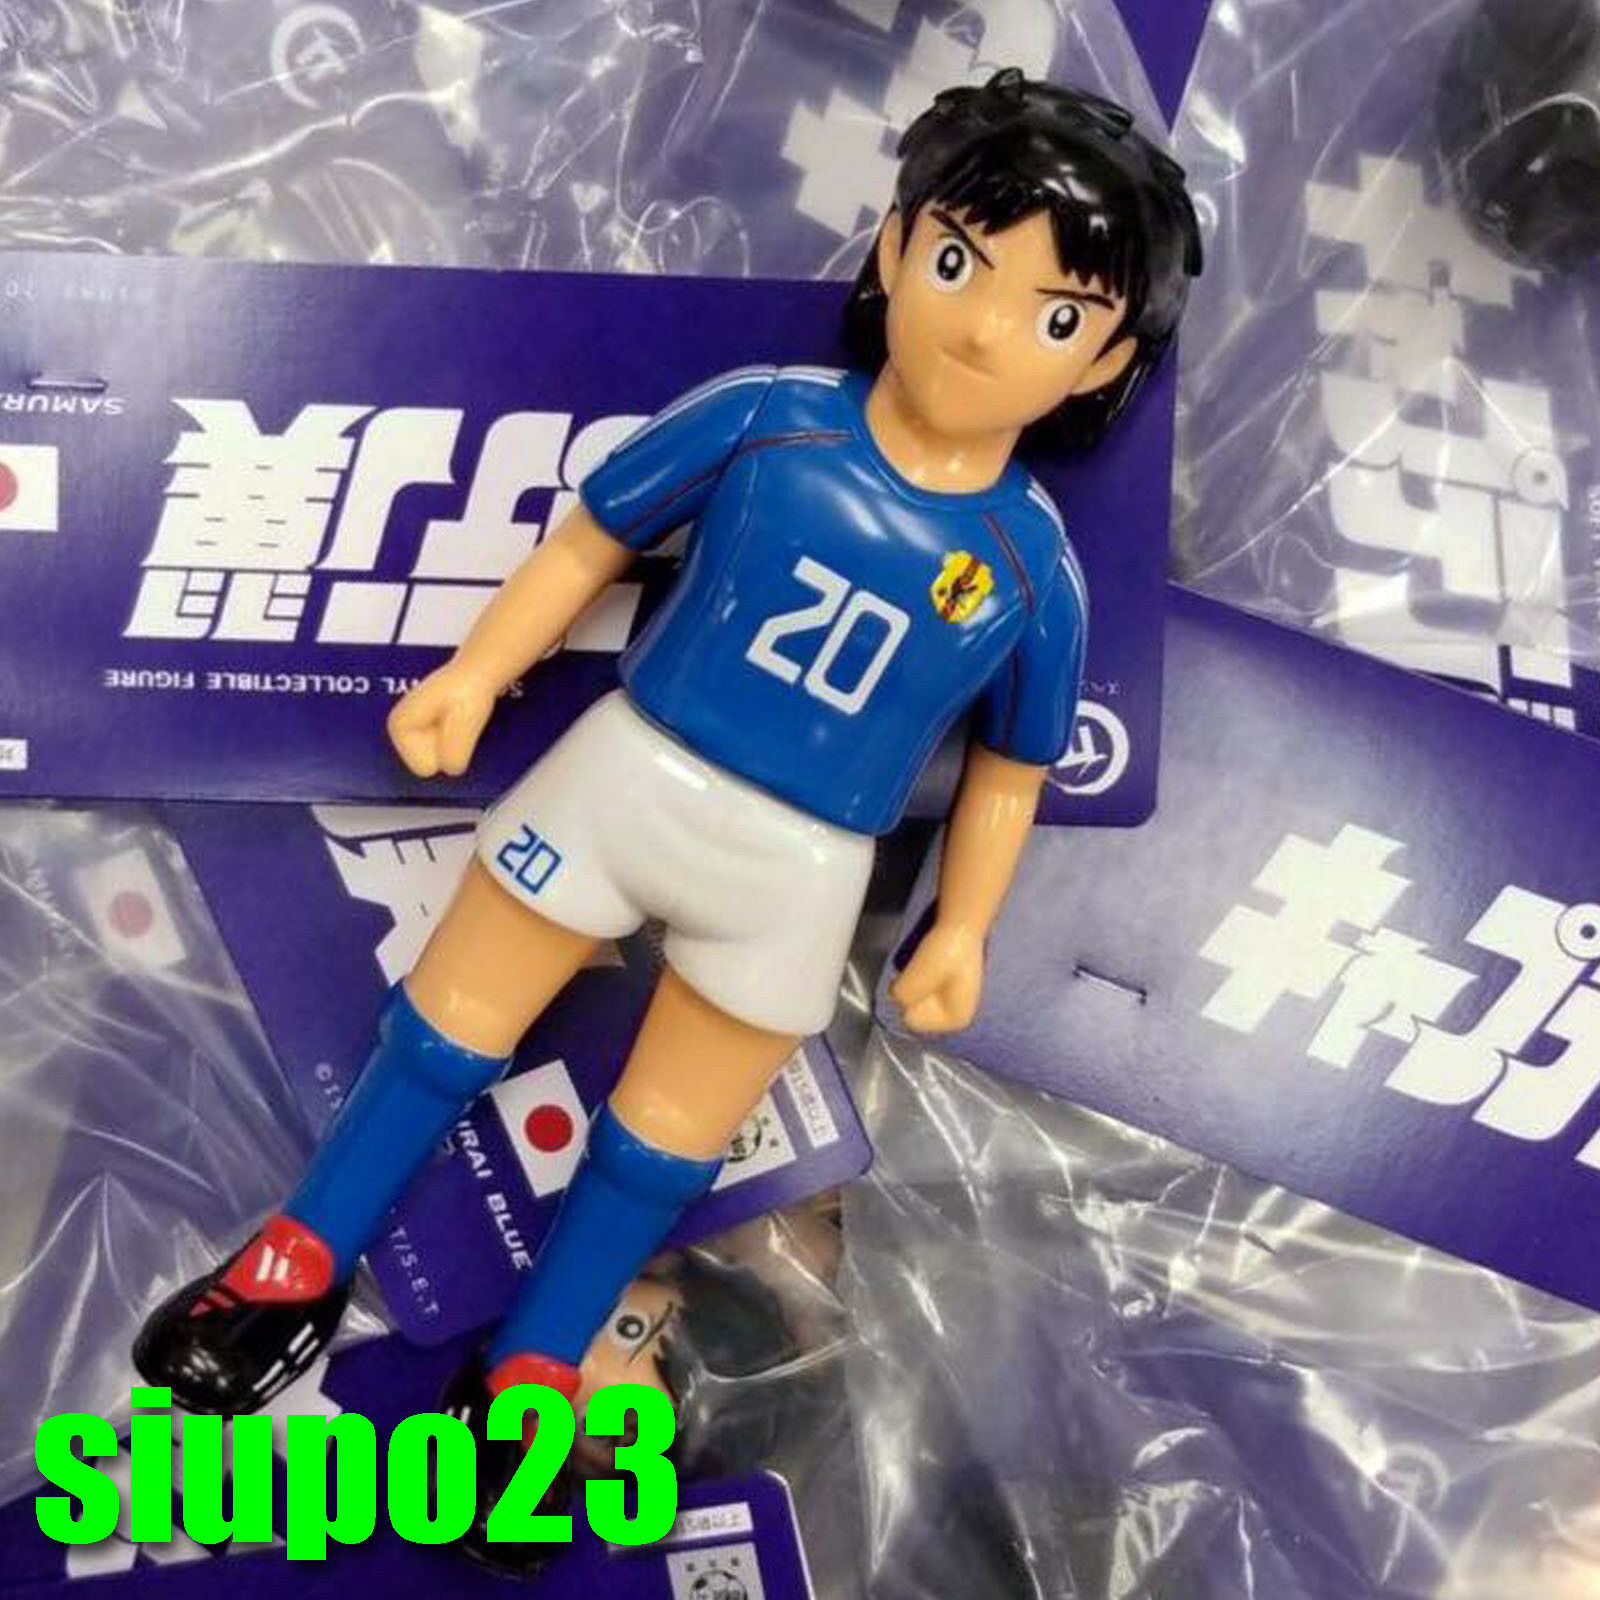 Kou Shou-do Capitán Tsubasa  taoi Shingo Vinilo Figura Abeja. webzine Edition